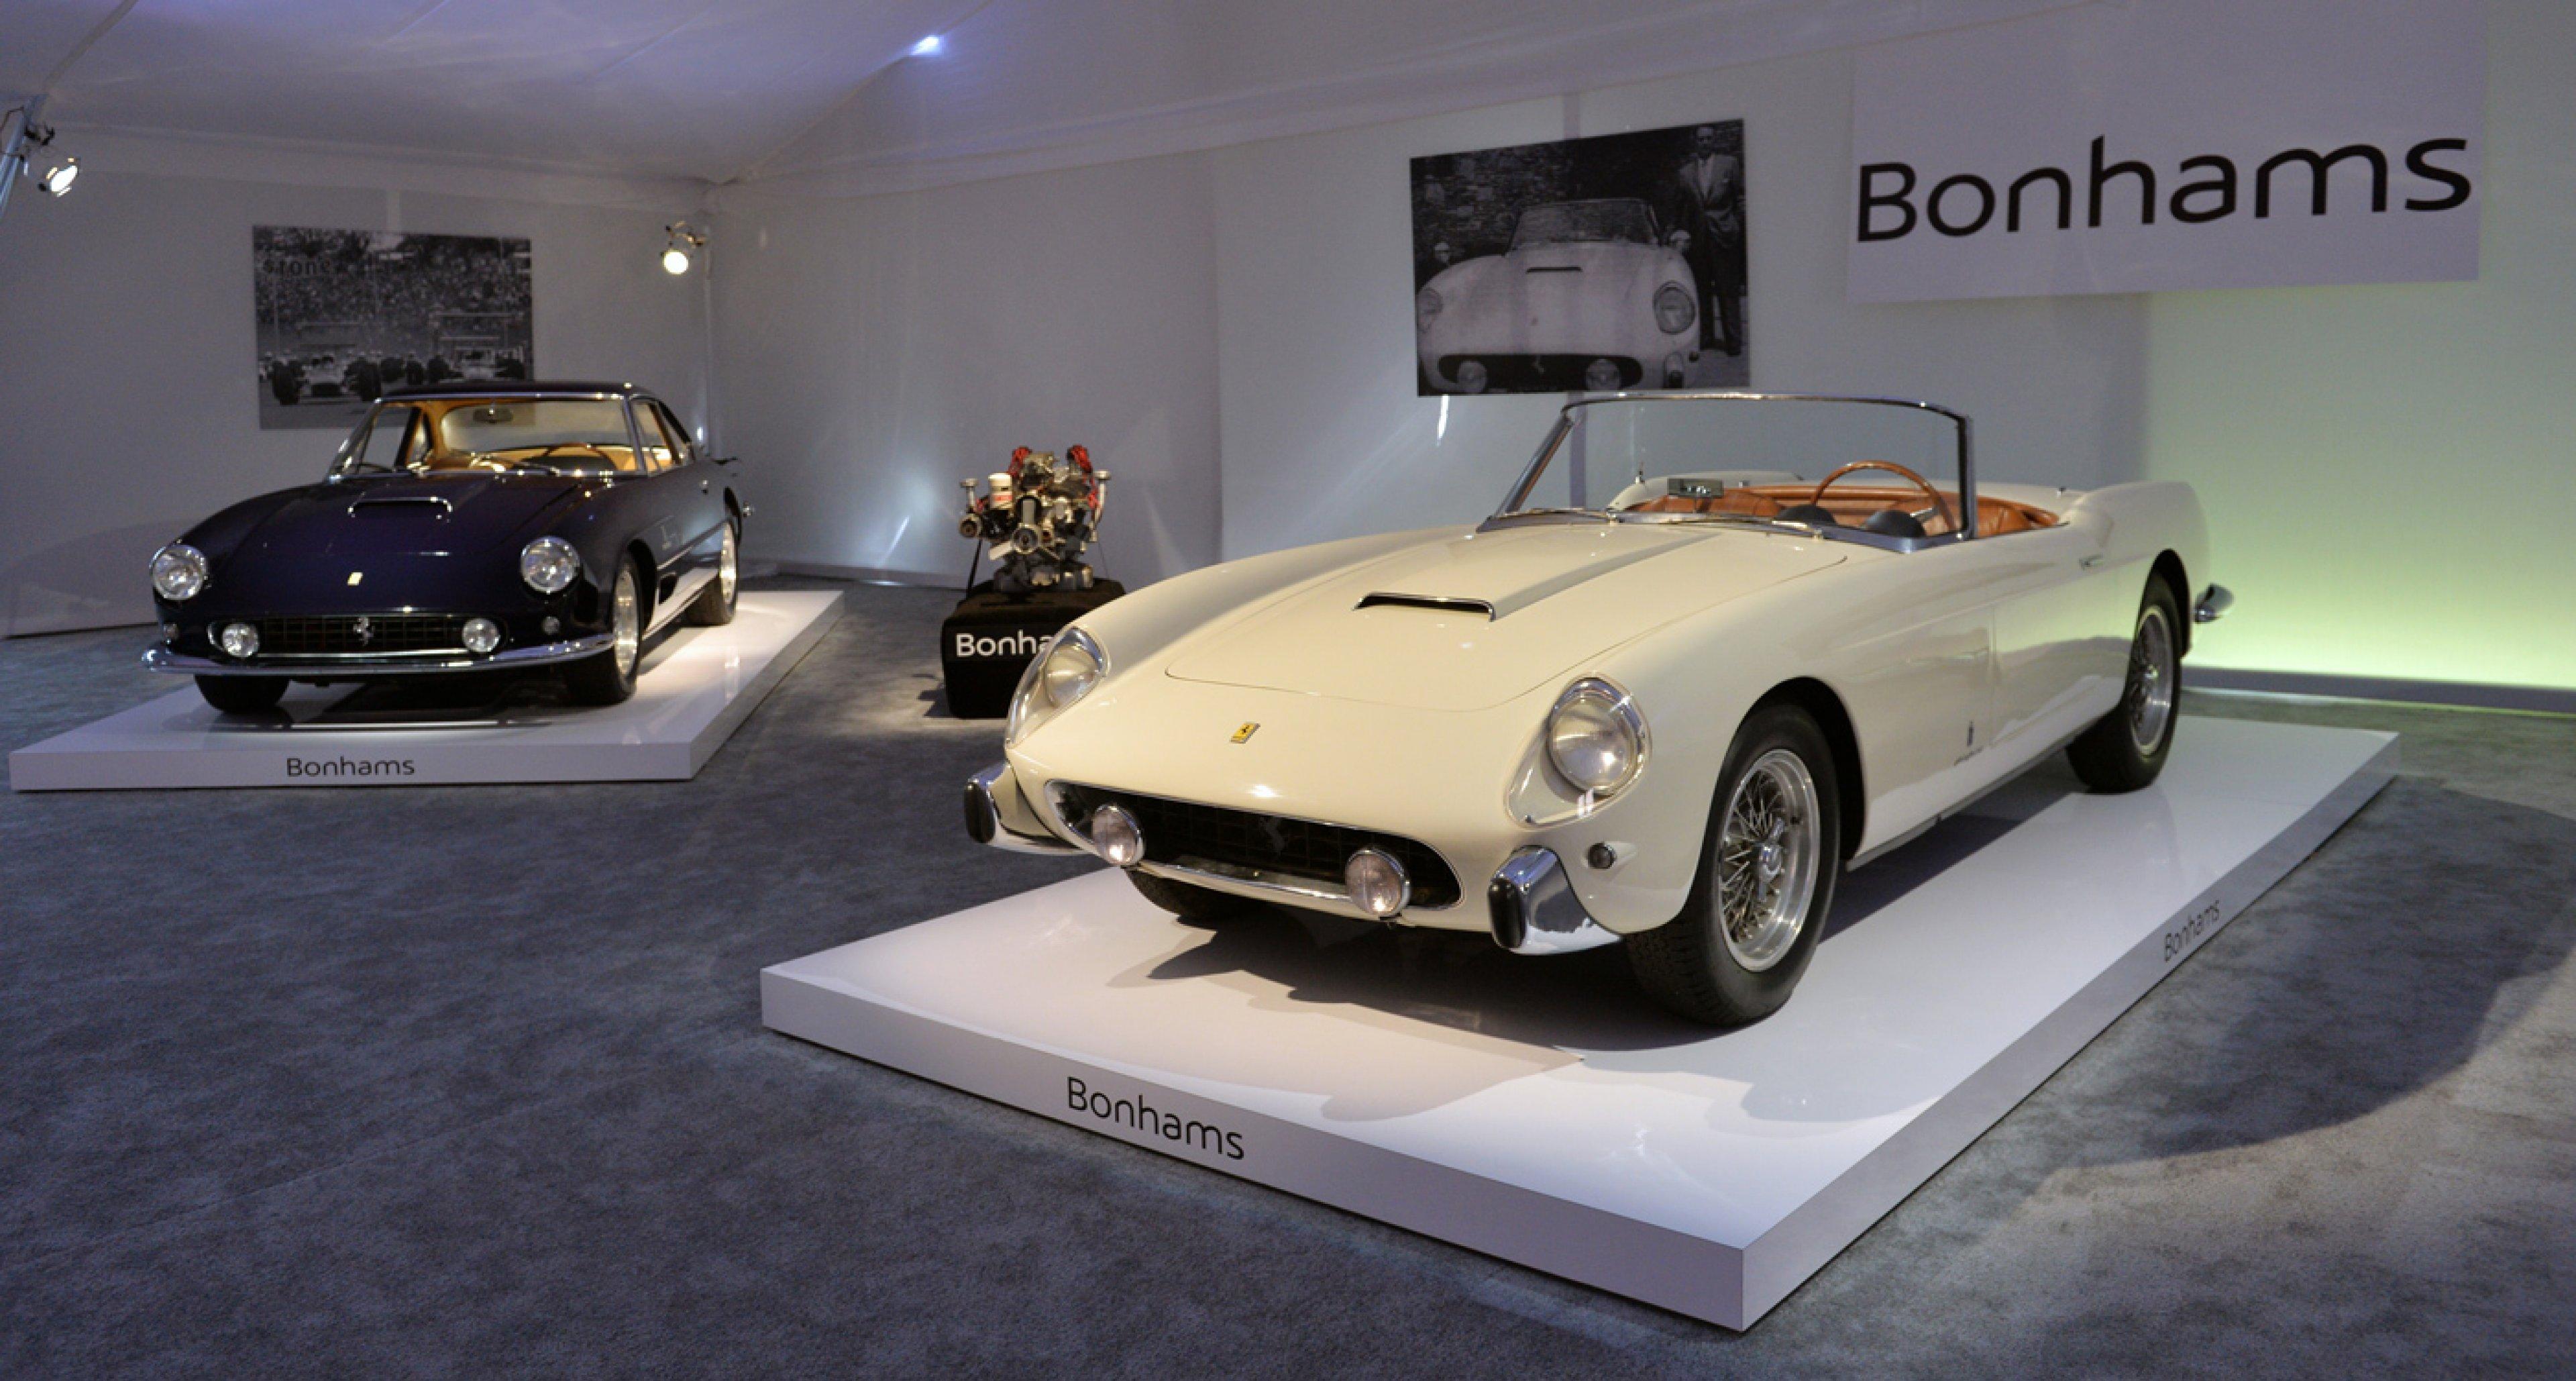 1958 Ferrari 250 GT Series 1 Cabriolet sold for USD 6,820,000 at Bonhams Quail Lodge sale 2014